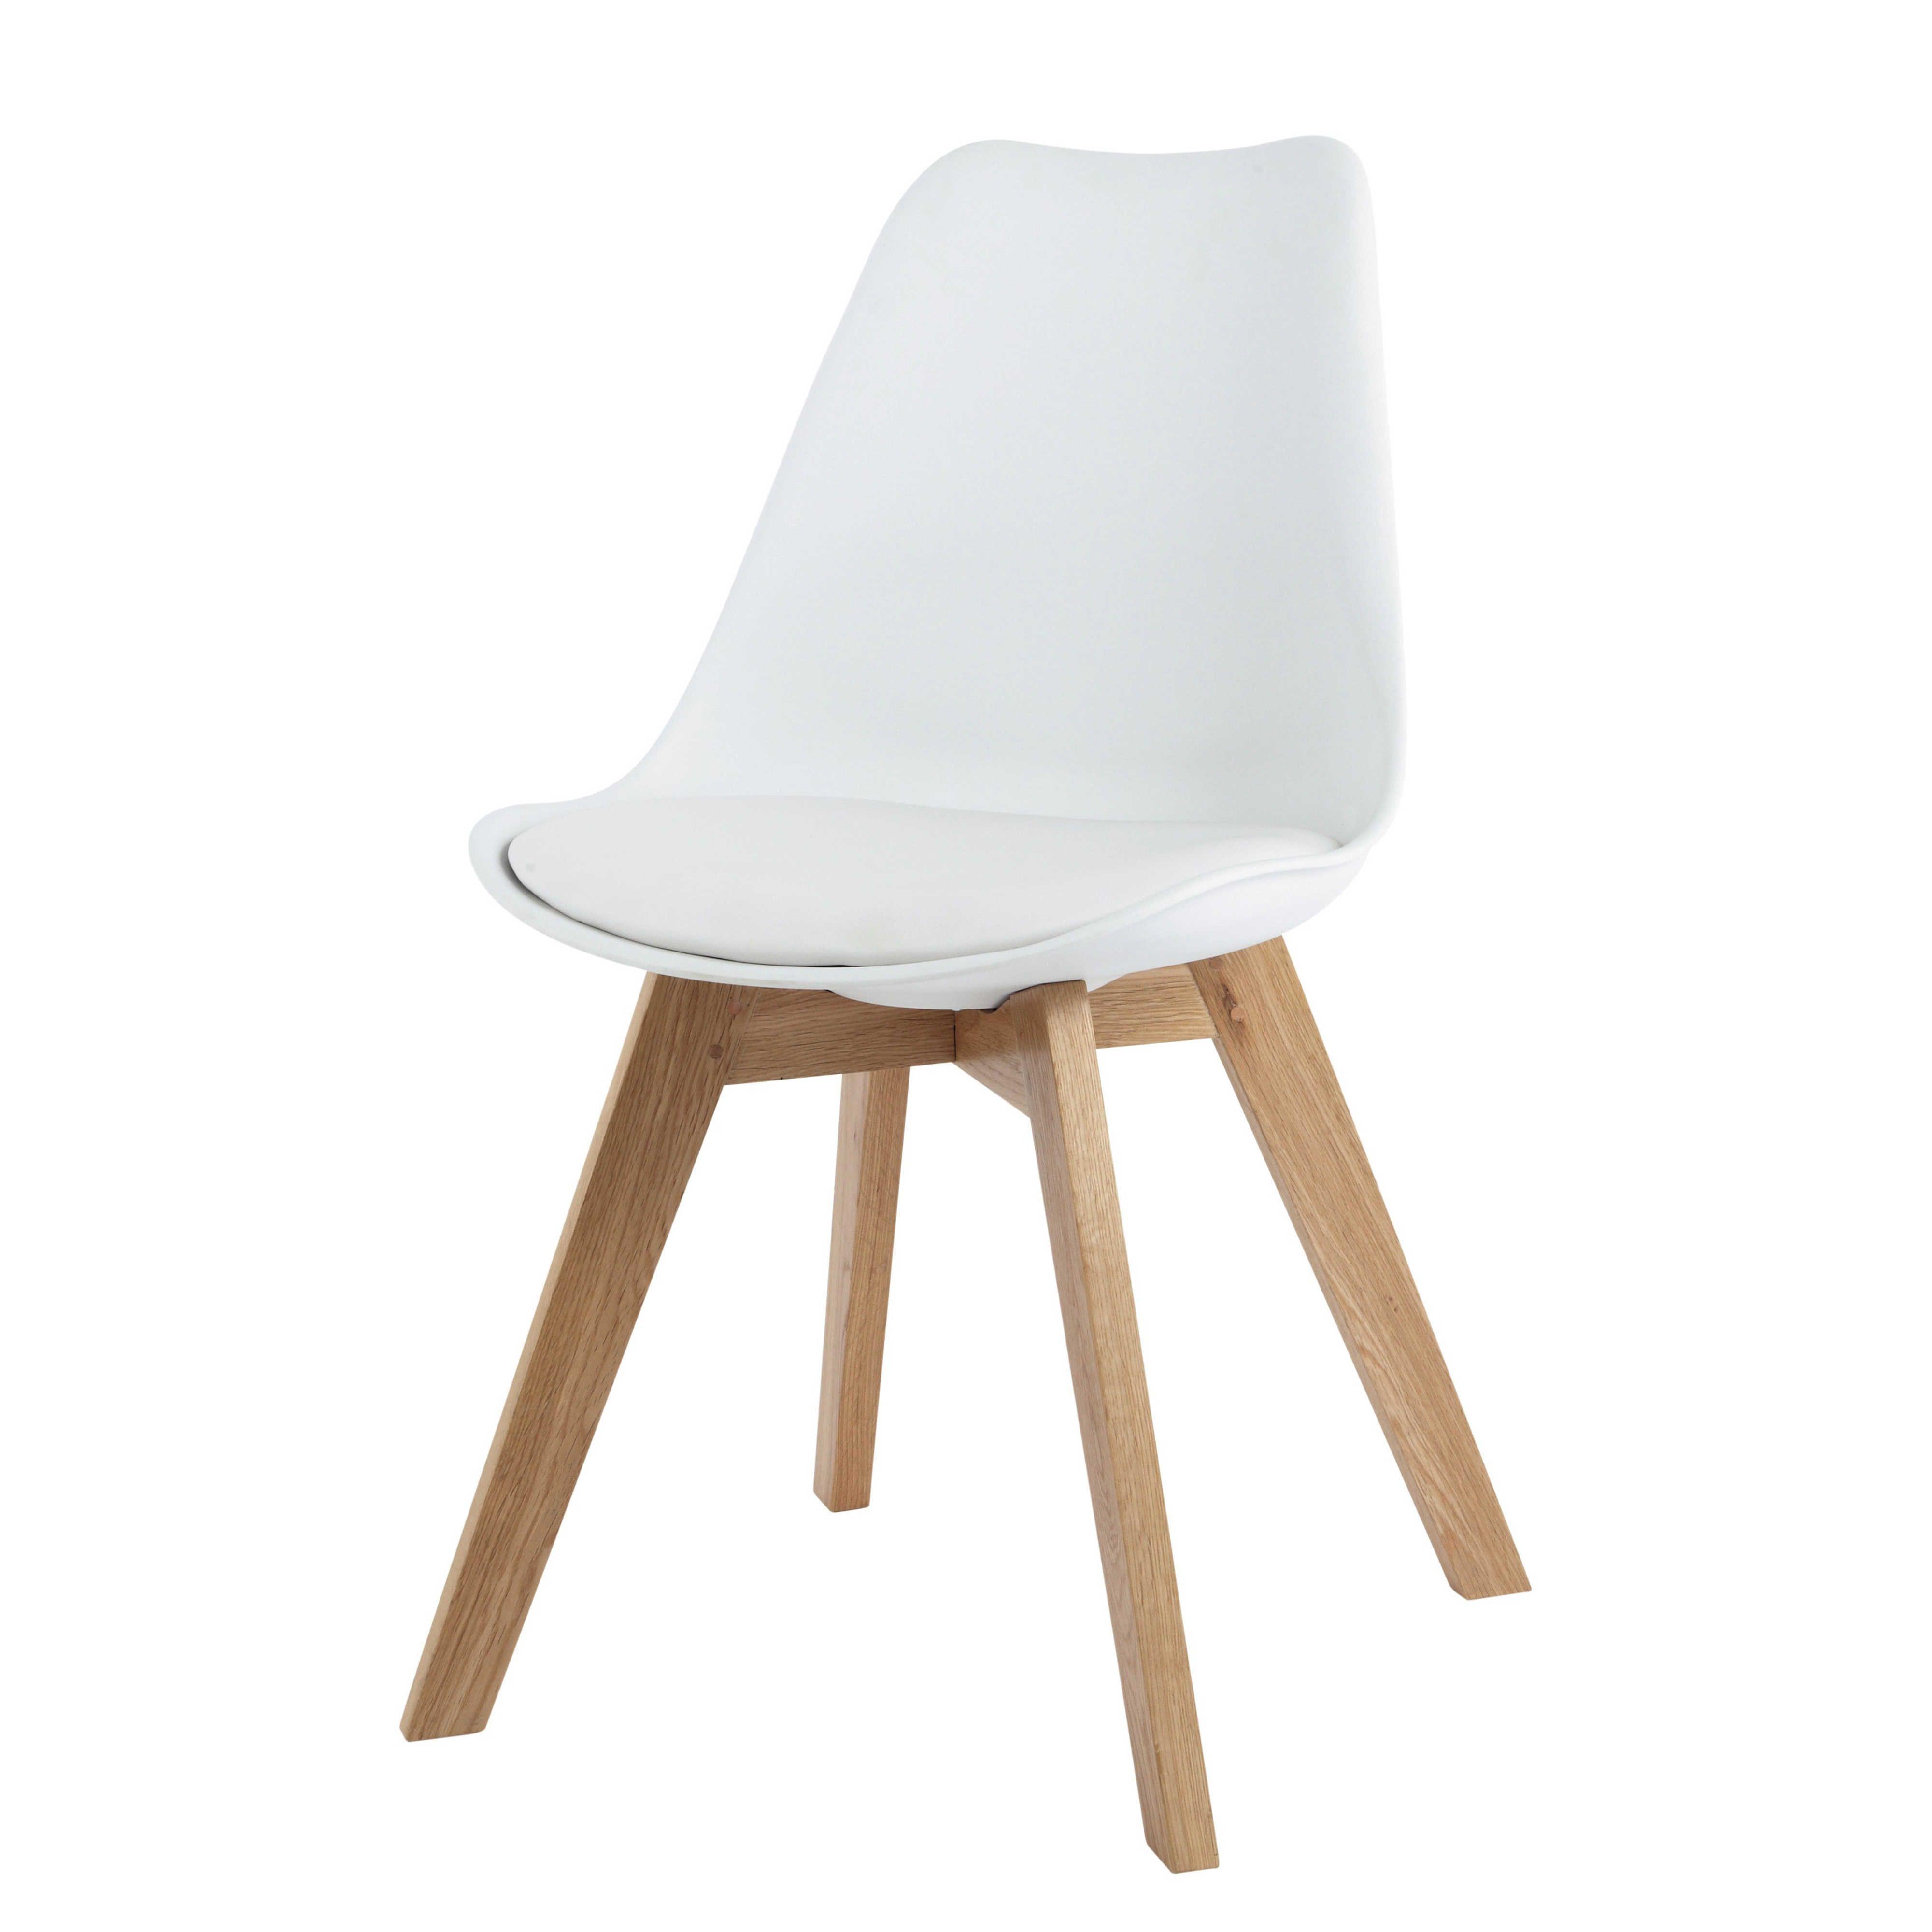 Silla Escandinava Blanca Con Roble Macizo Scandinavian Chairs Solid Oak Scandinavian Style